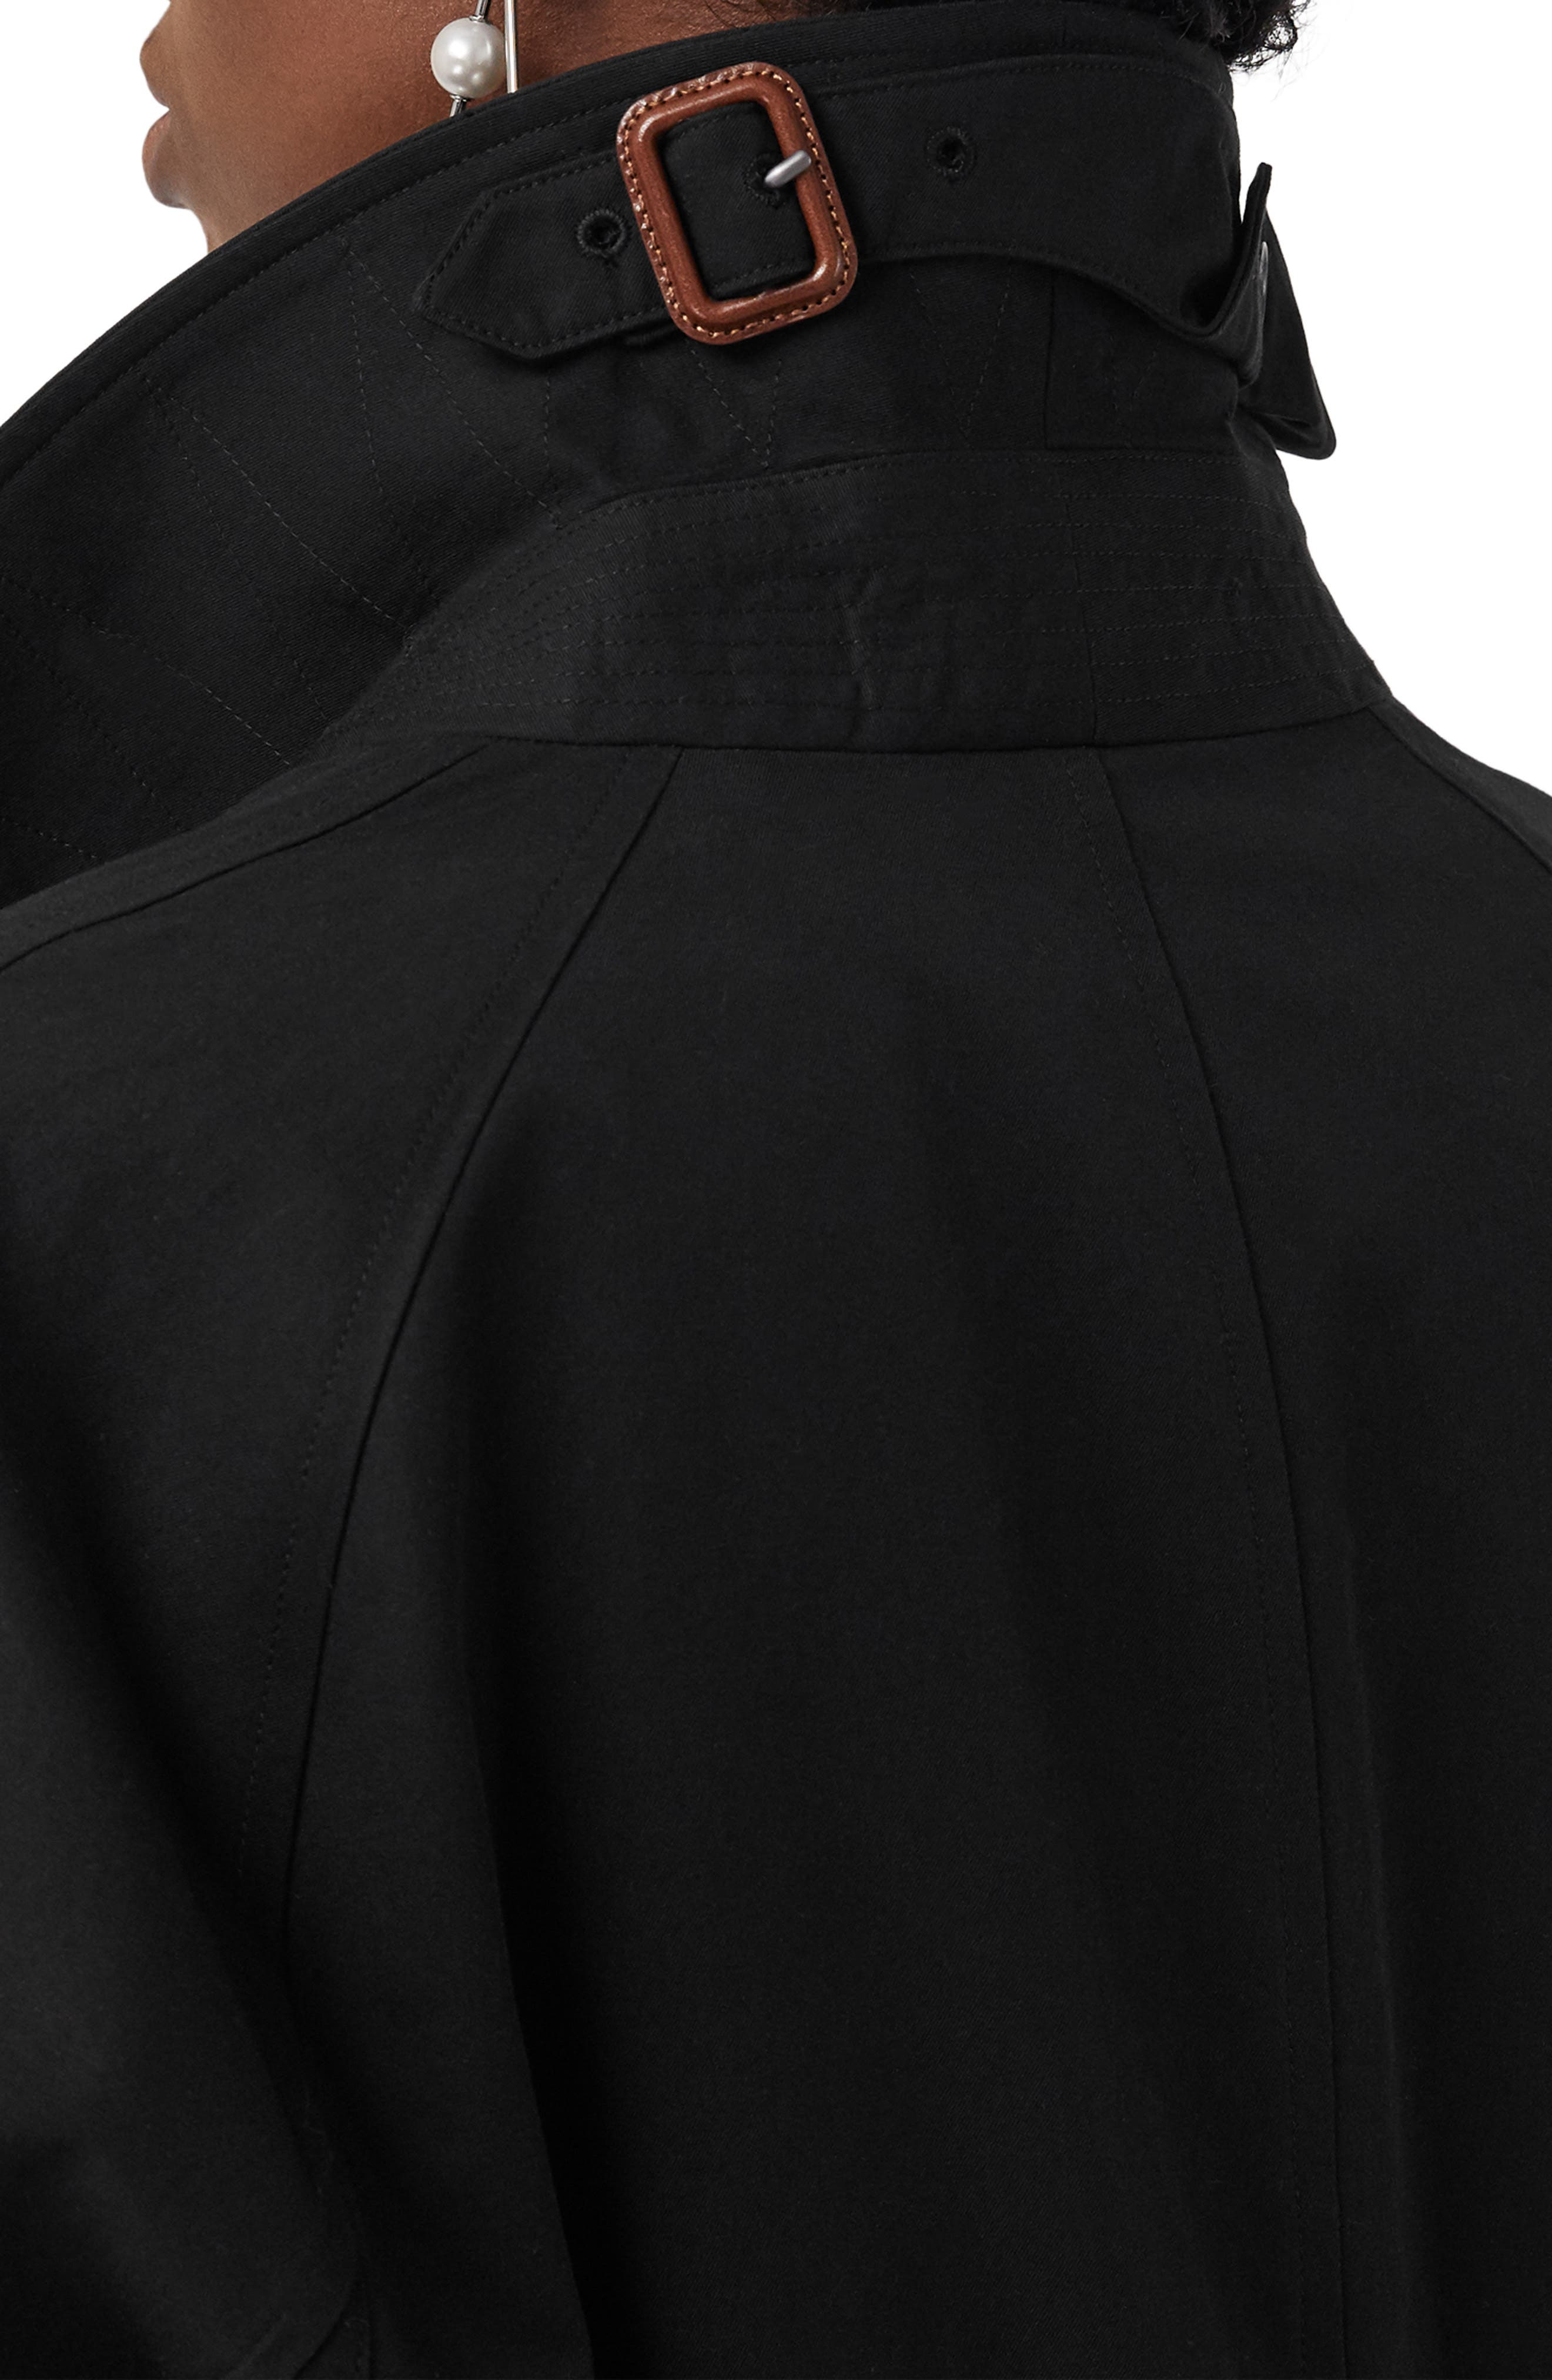 Camden Cotton Car Coat,                             Alternate thumbnail 3, color,                             BLACK